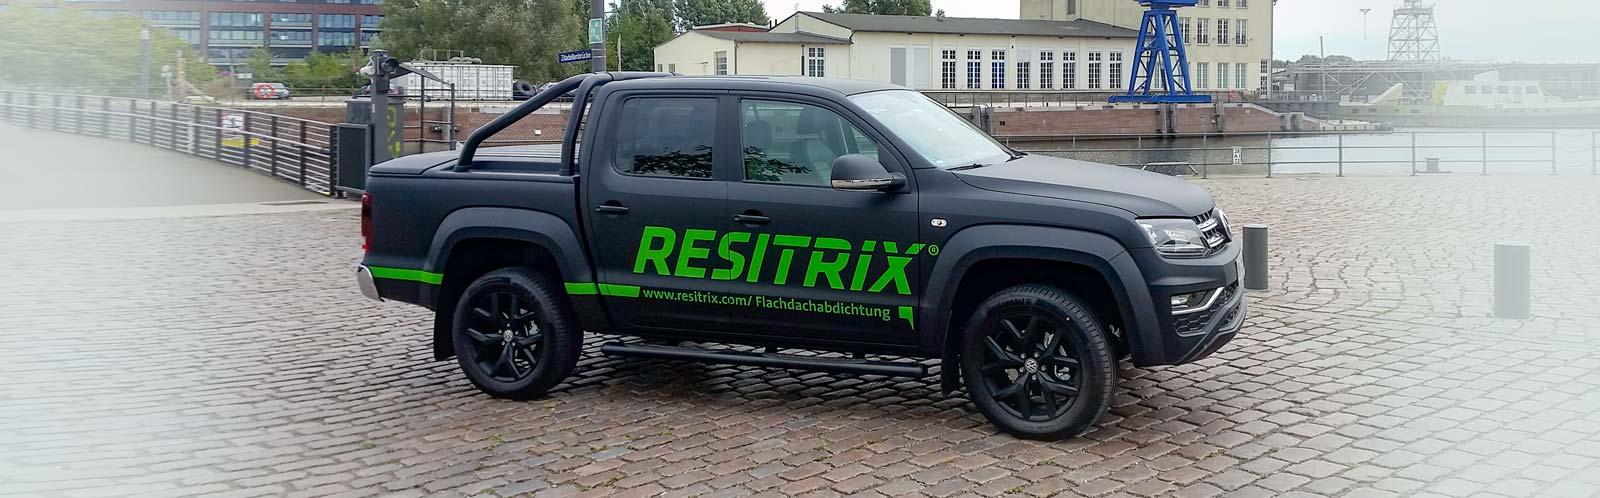 Autobeschriftung Pickup Resitrix